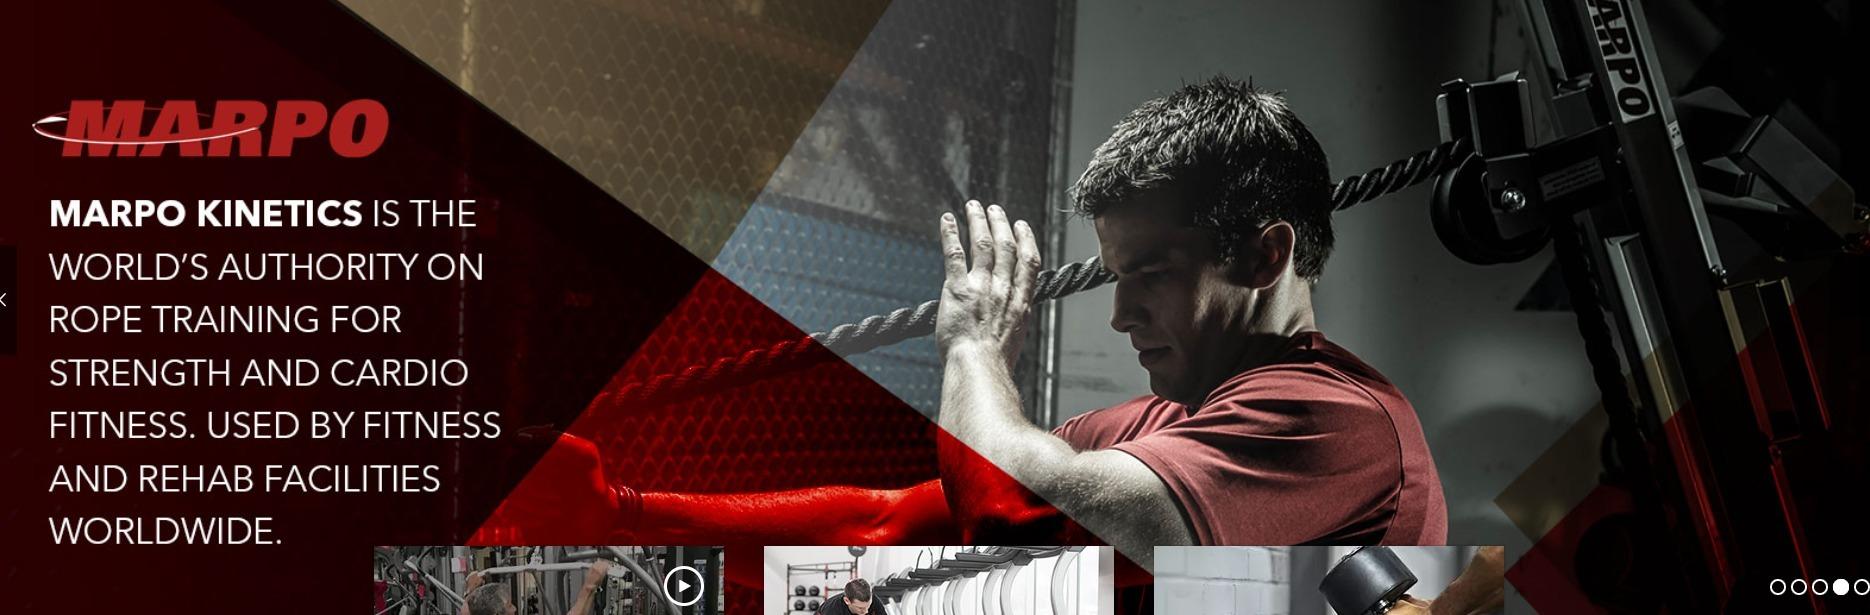 Crossfit equipment - Focus Fitness (@fusionfitness) Cover Image